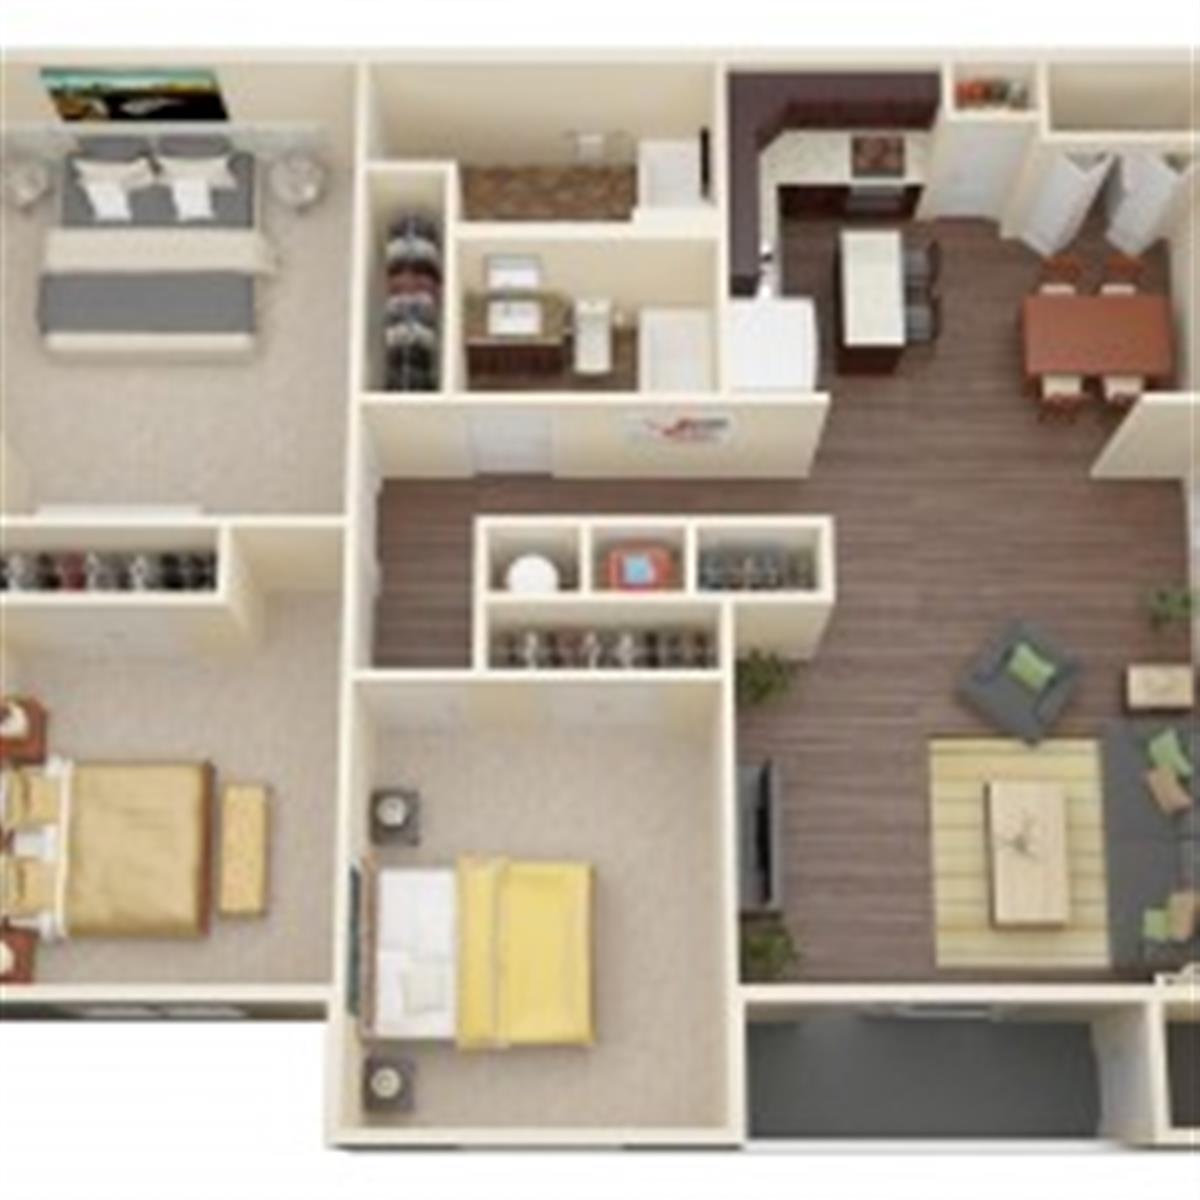 Apartment In Clarksville, TN